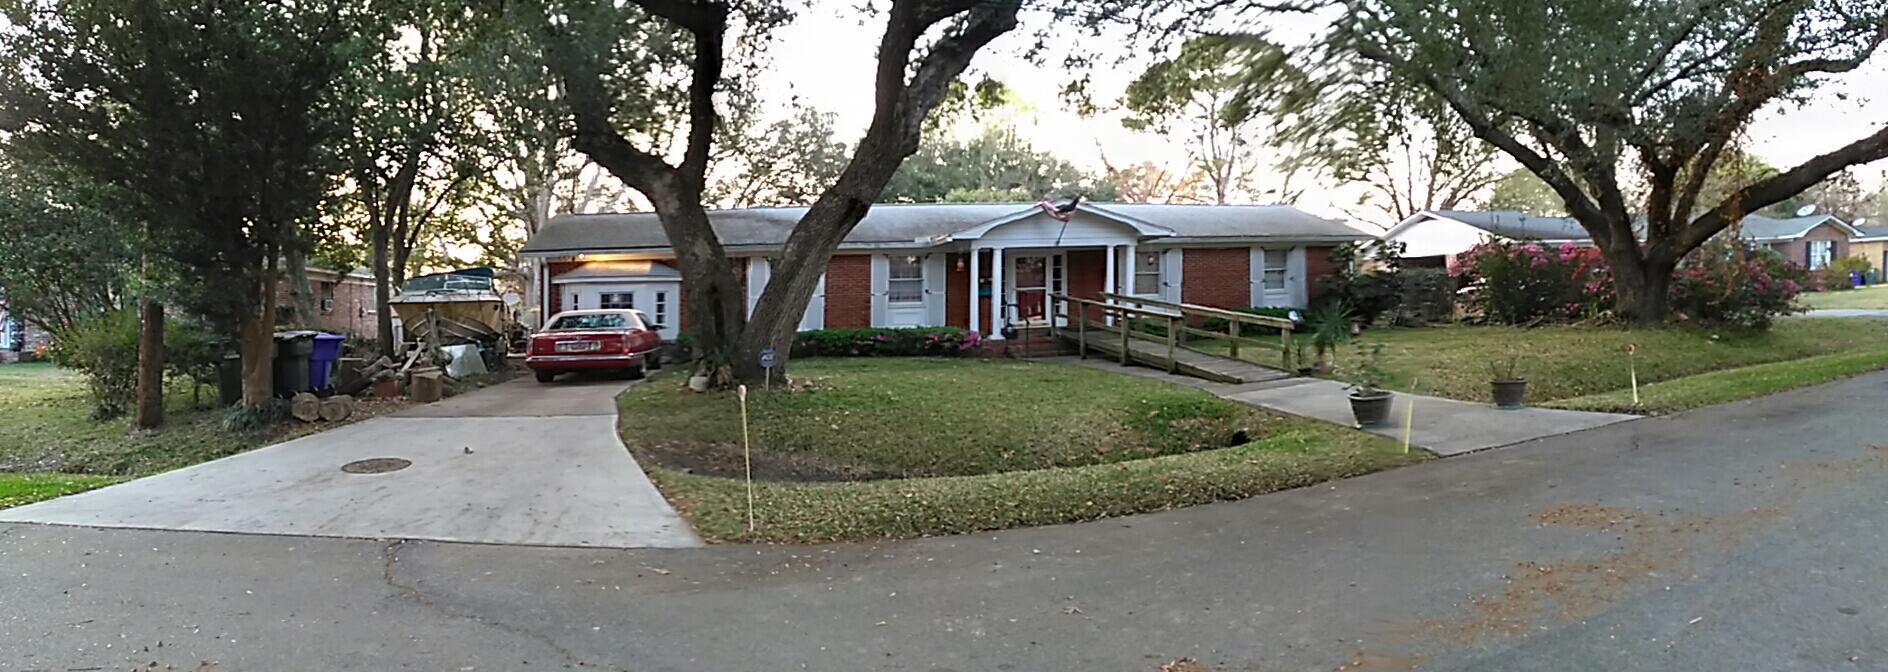 Lenevar Homes For Sale - 1412 Tara, Charleston, SC - 0